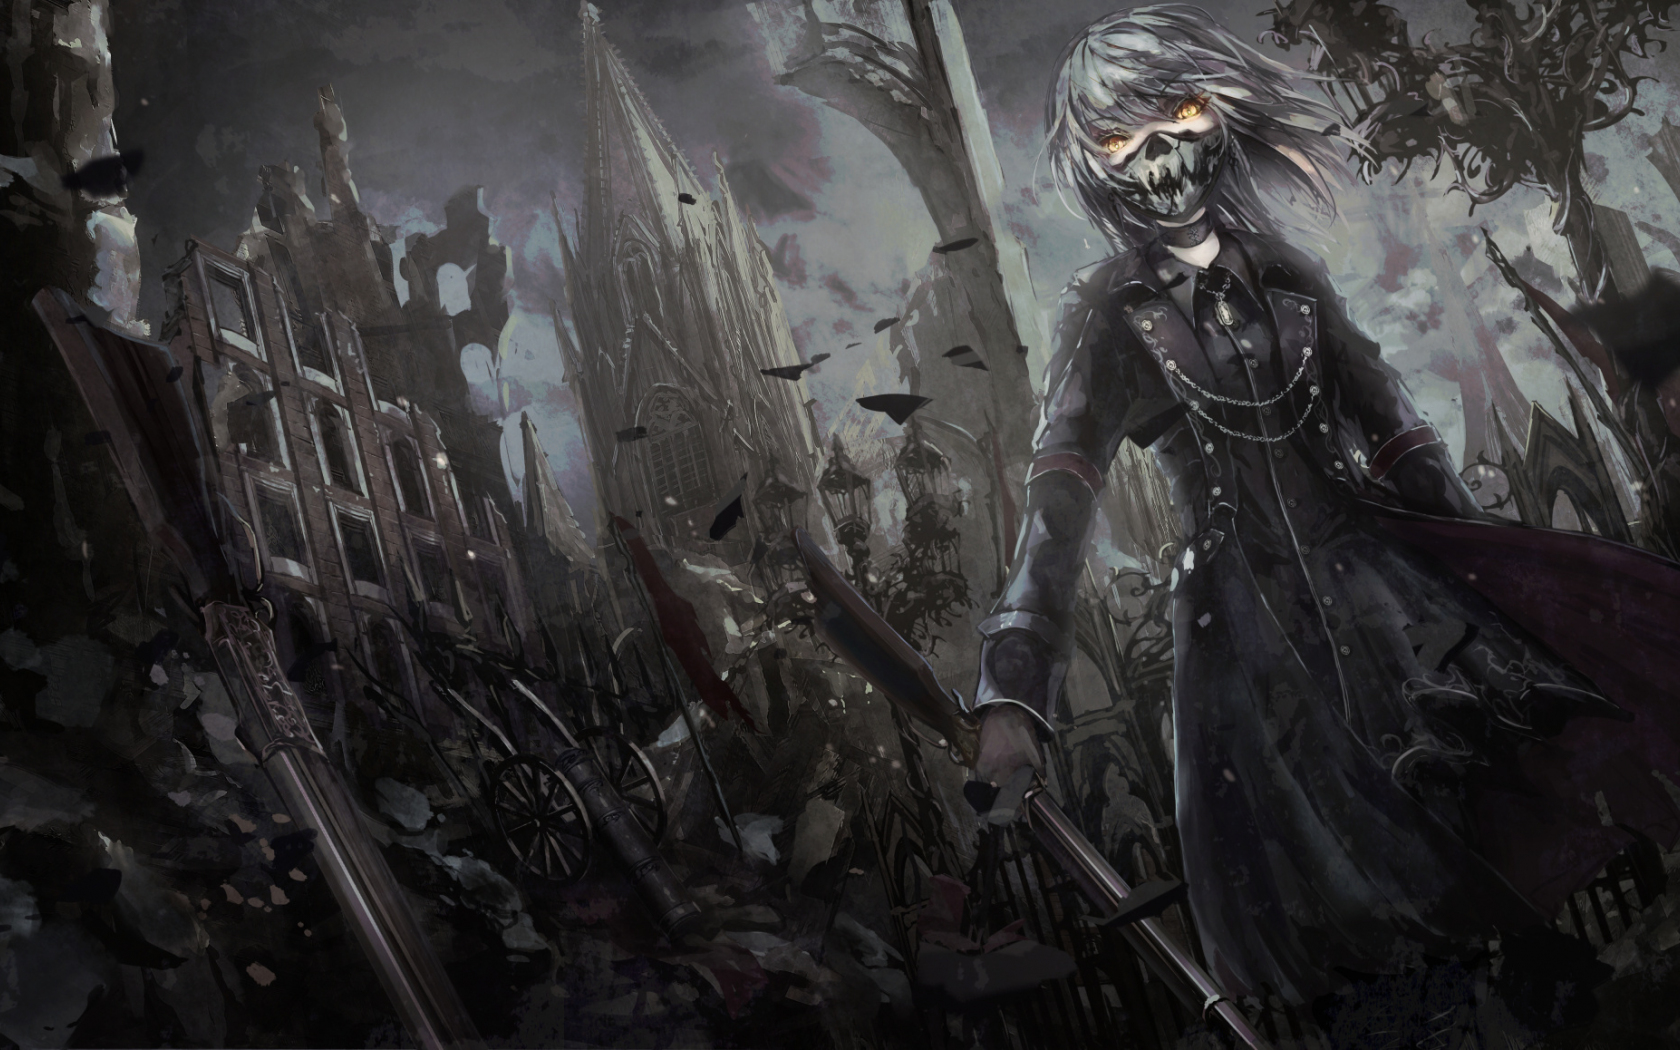 1680x1050 wallpaper dark anime girl with gun mask art